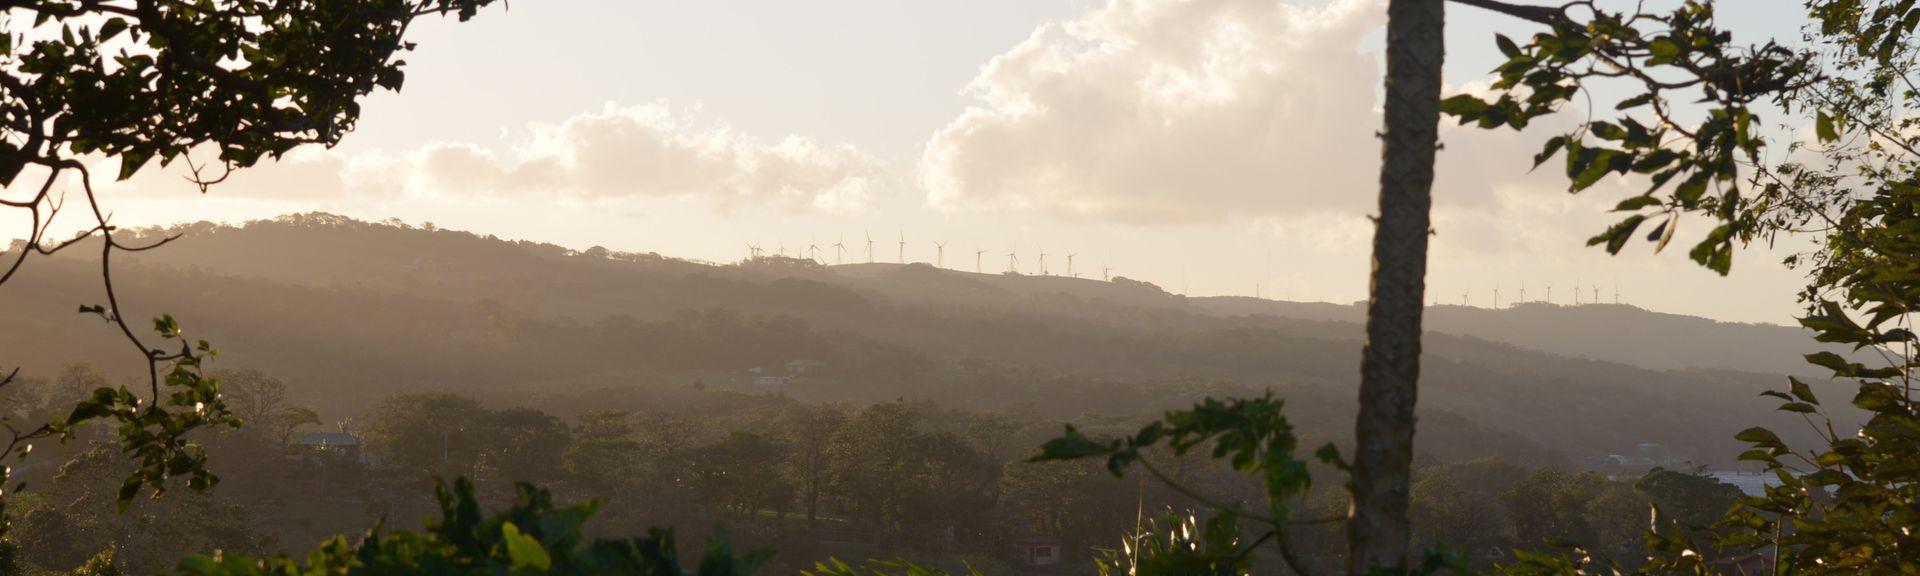 Nuevo Arenal, Provinz Guanacaste, Costa Rica